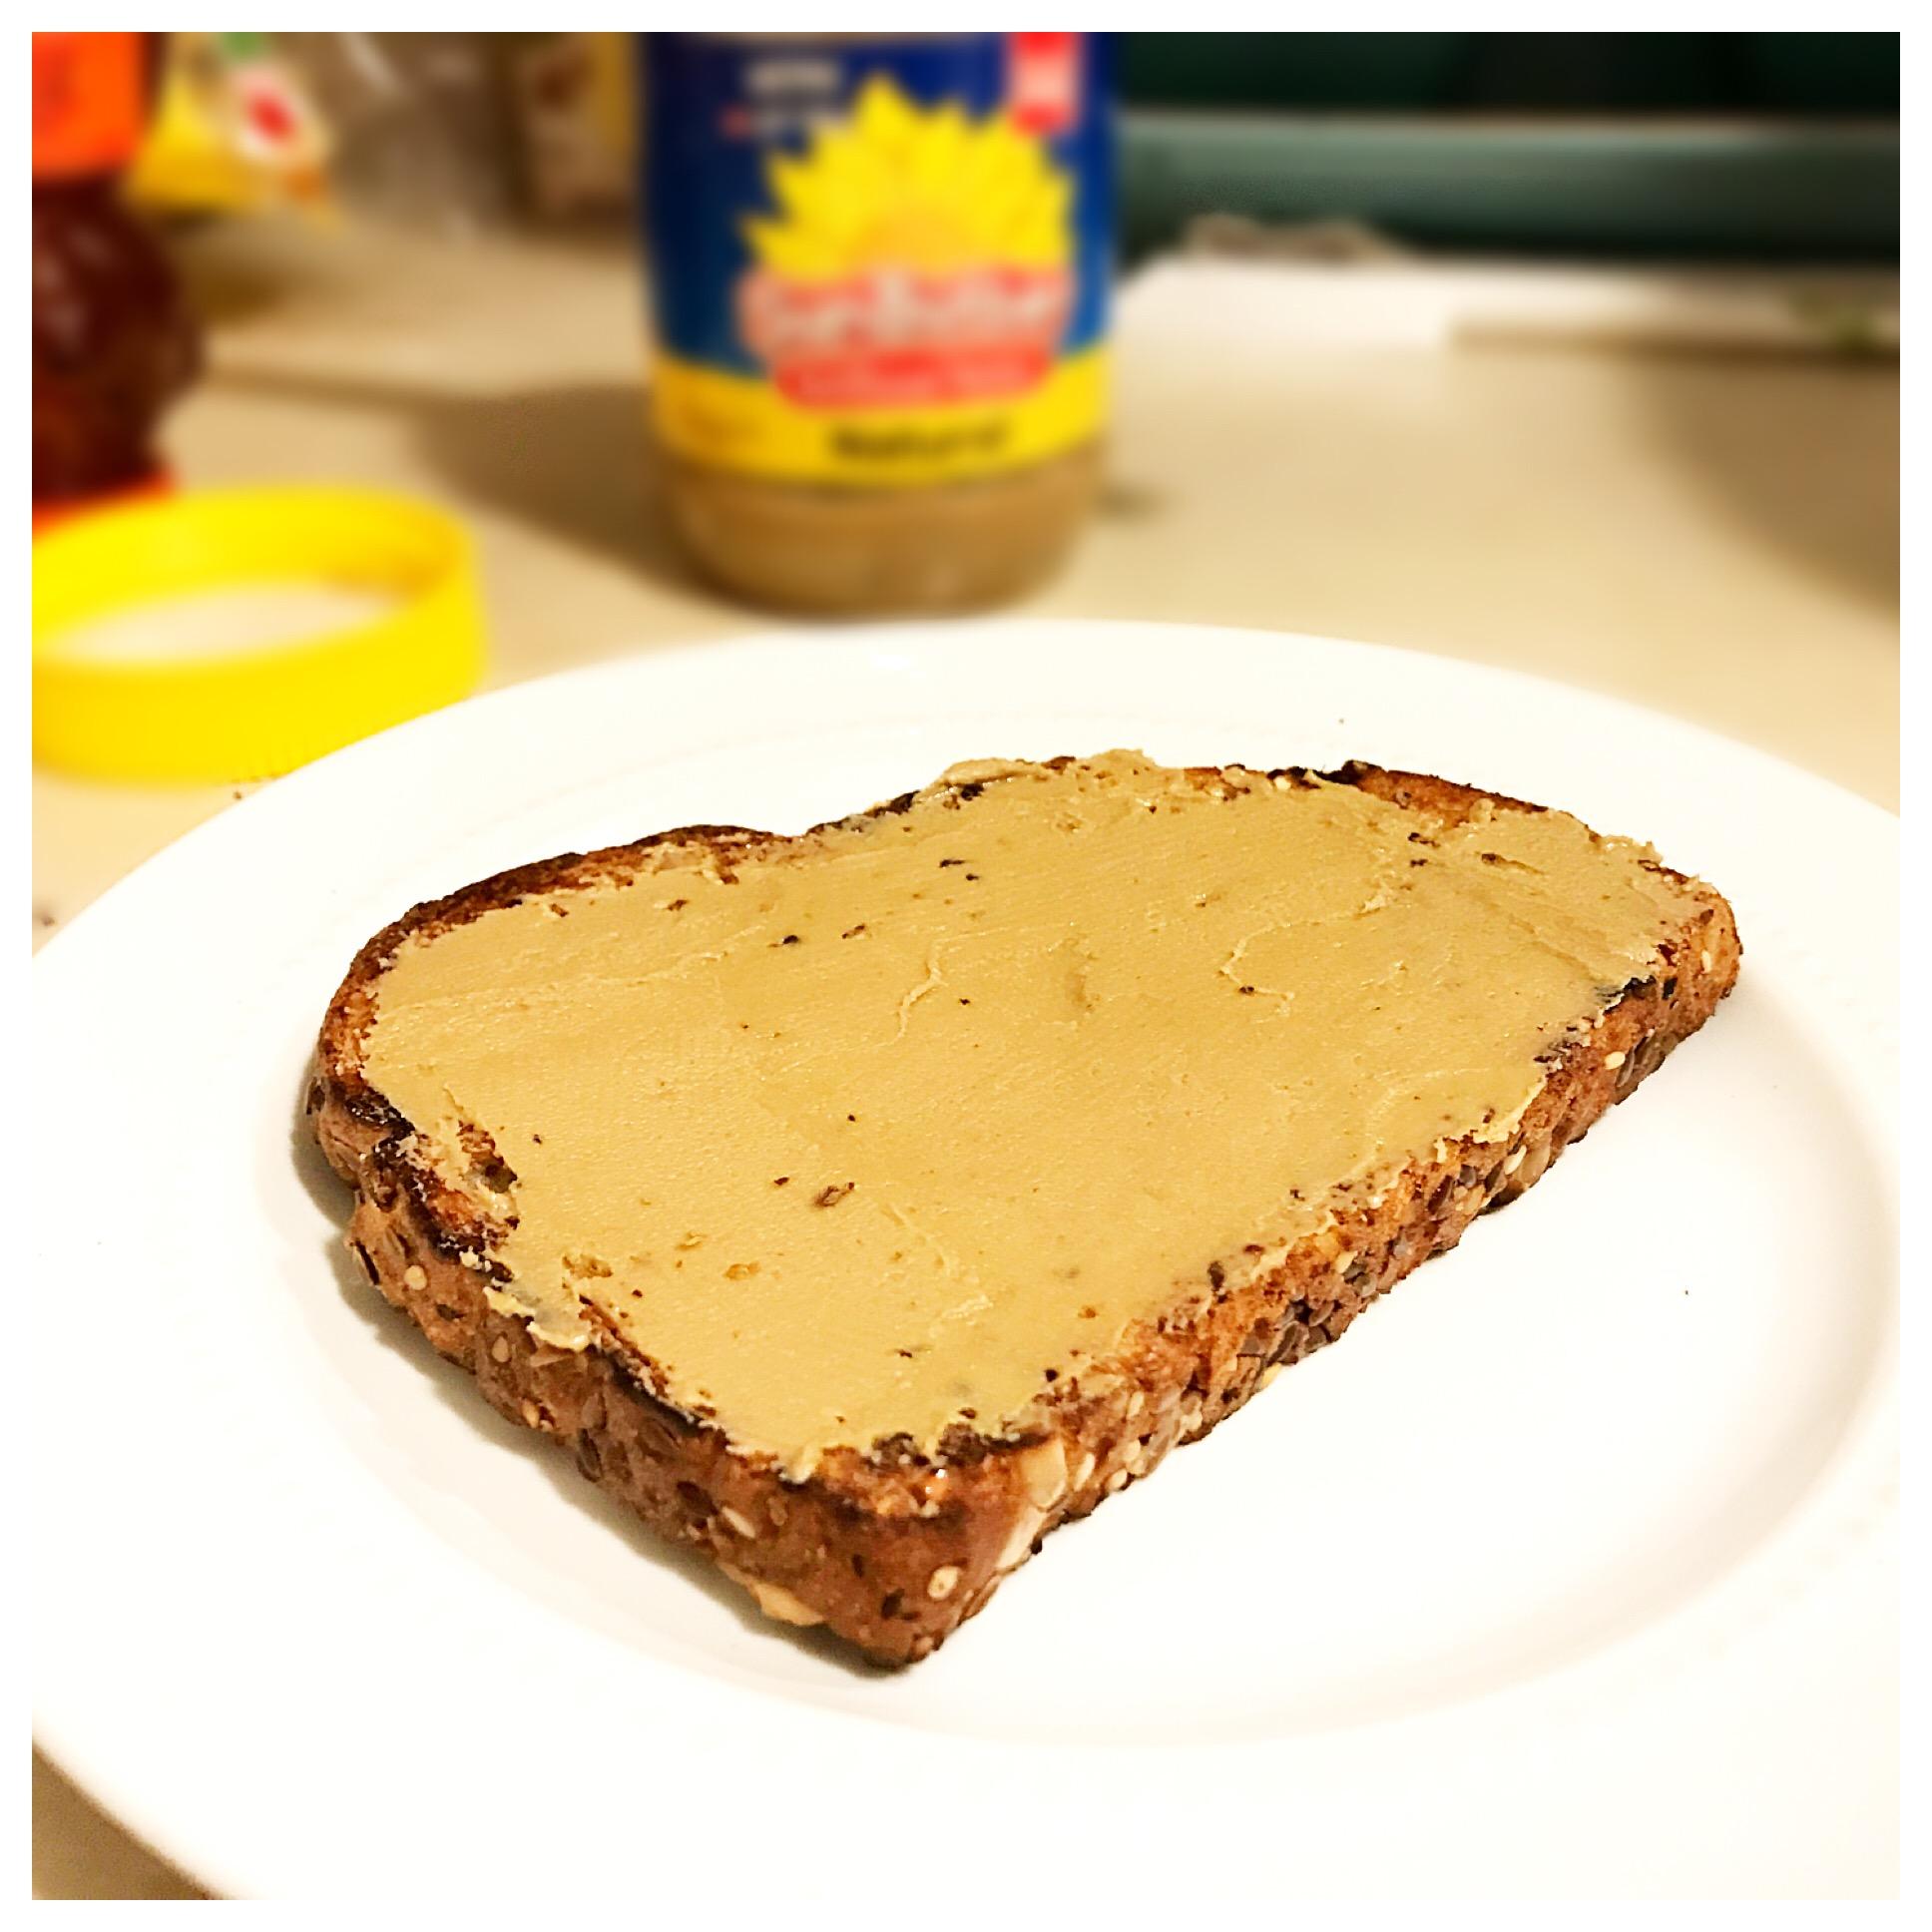 cinn apple toast step 2.JPG